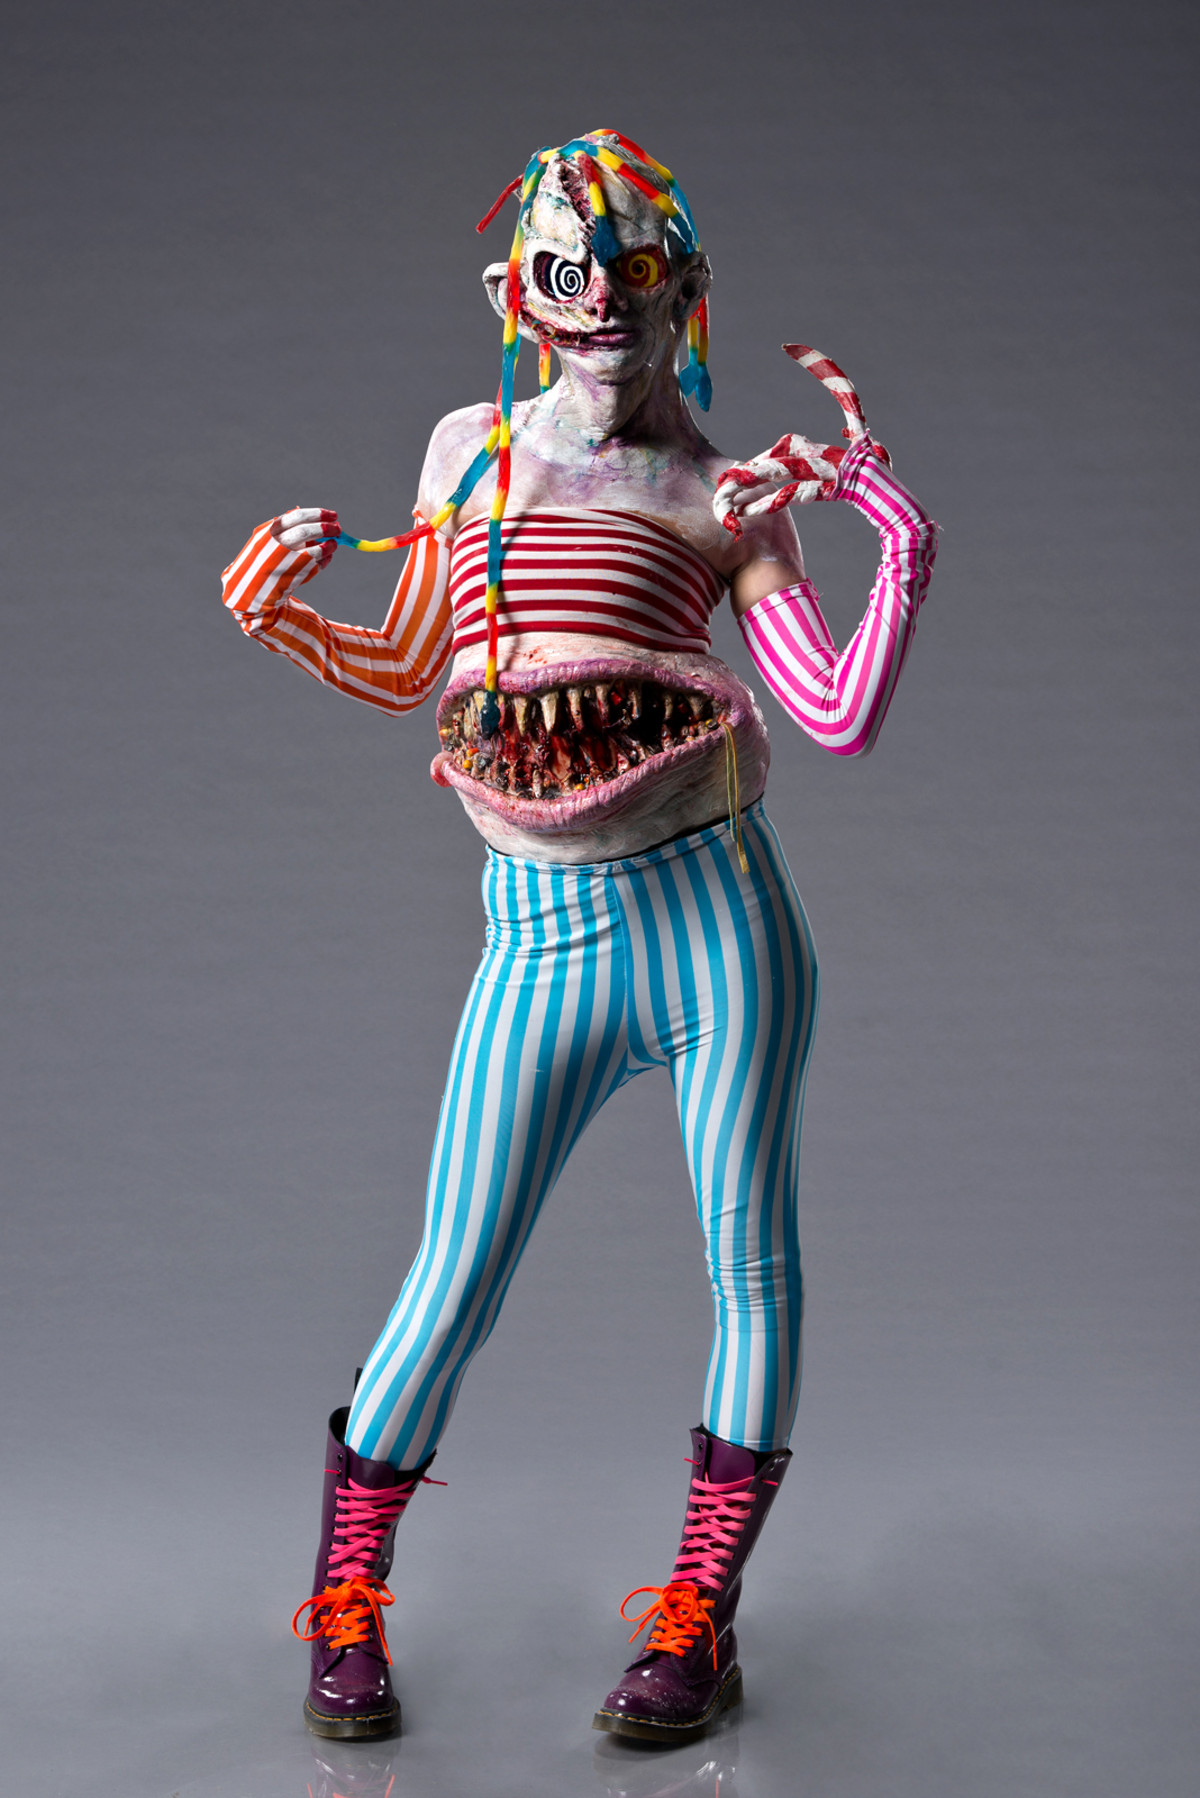 Sweet Tooth Suzy Non Alien Creatures Wiki Fandom